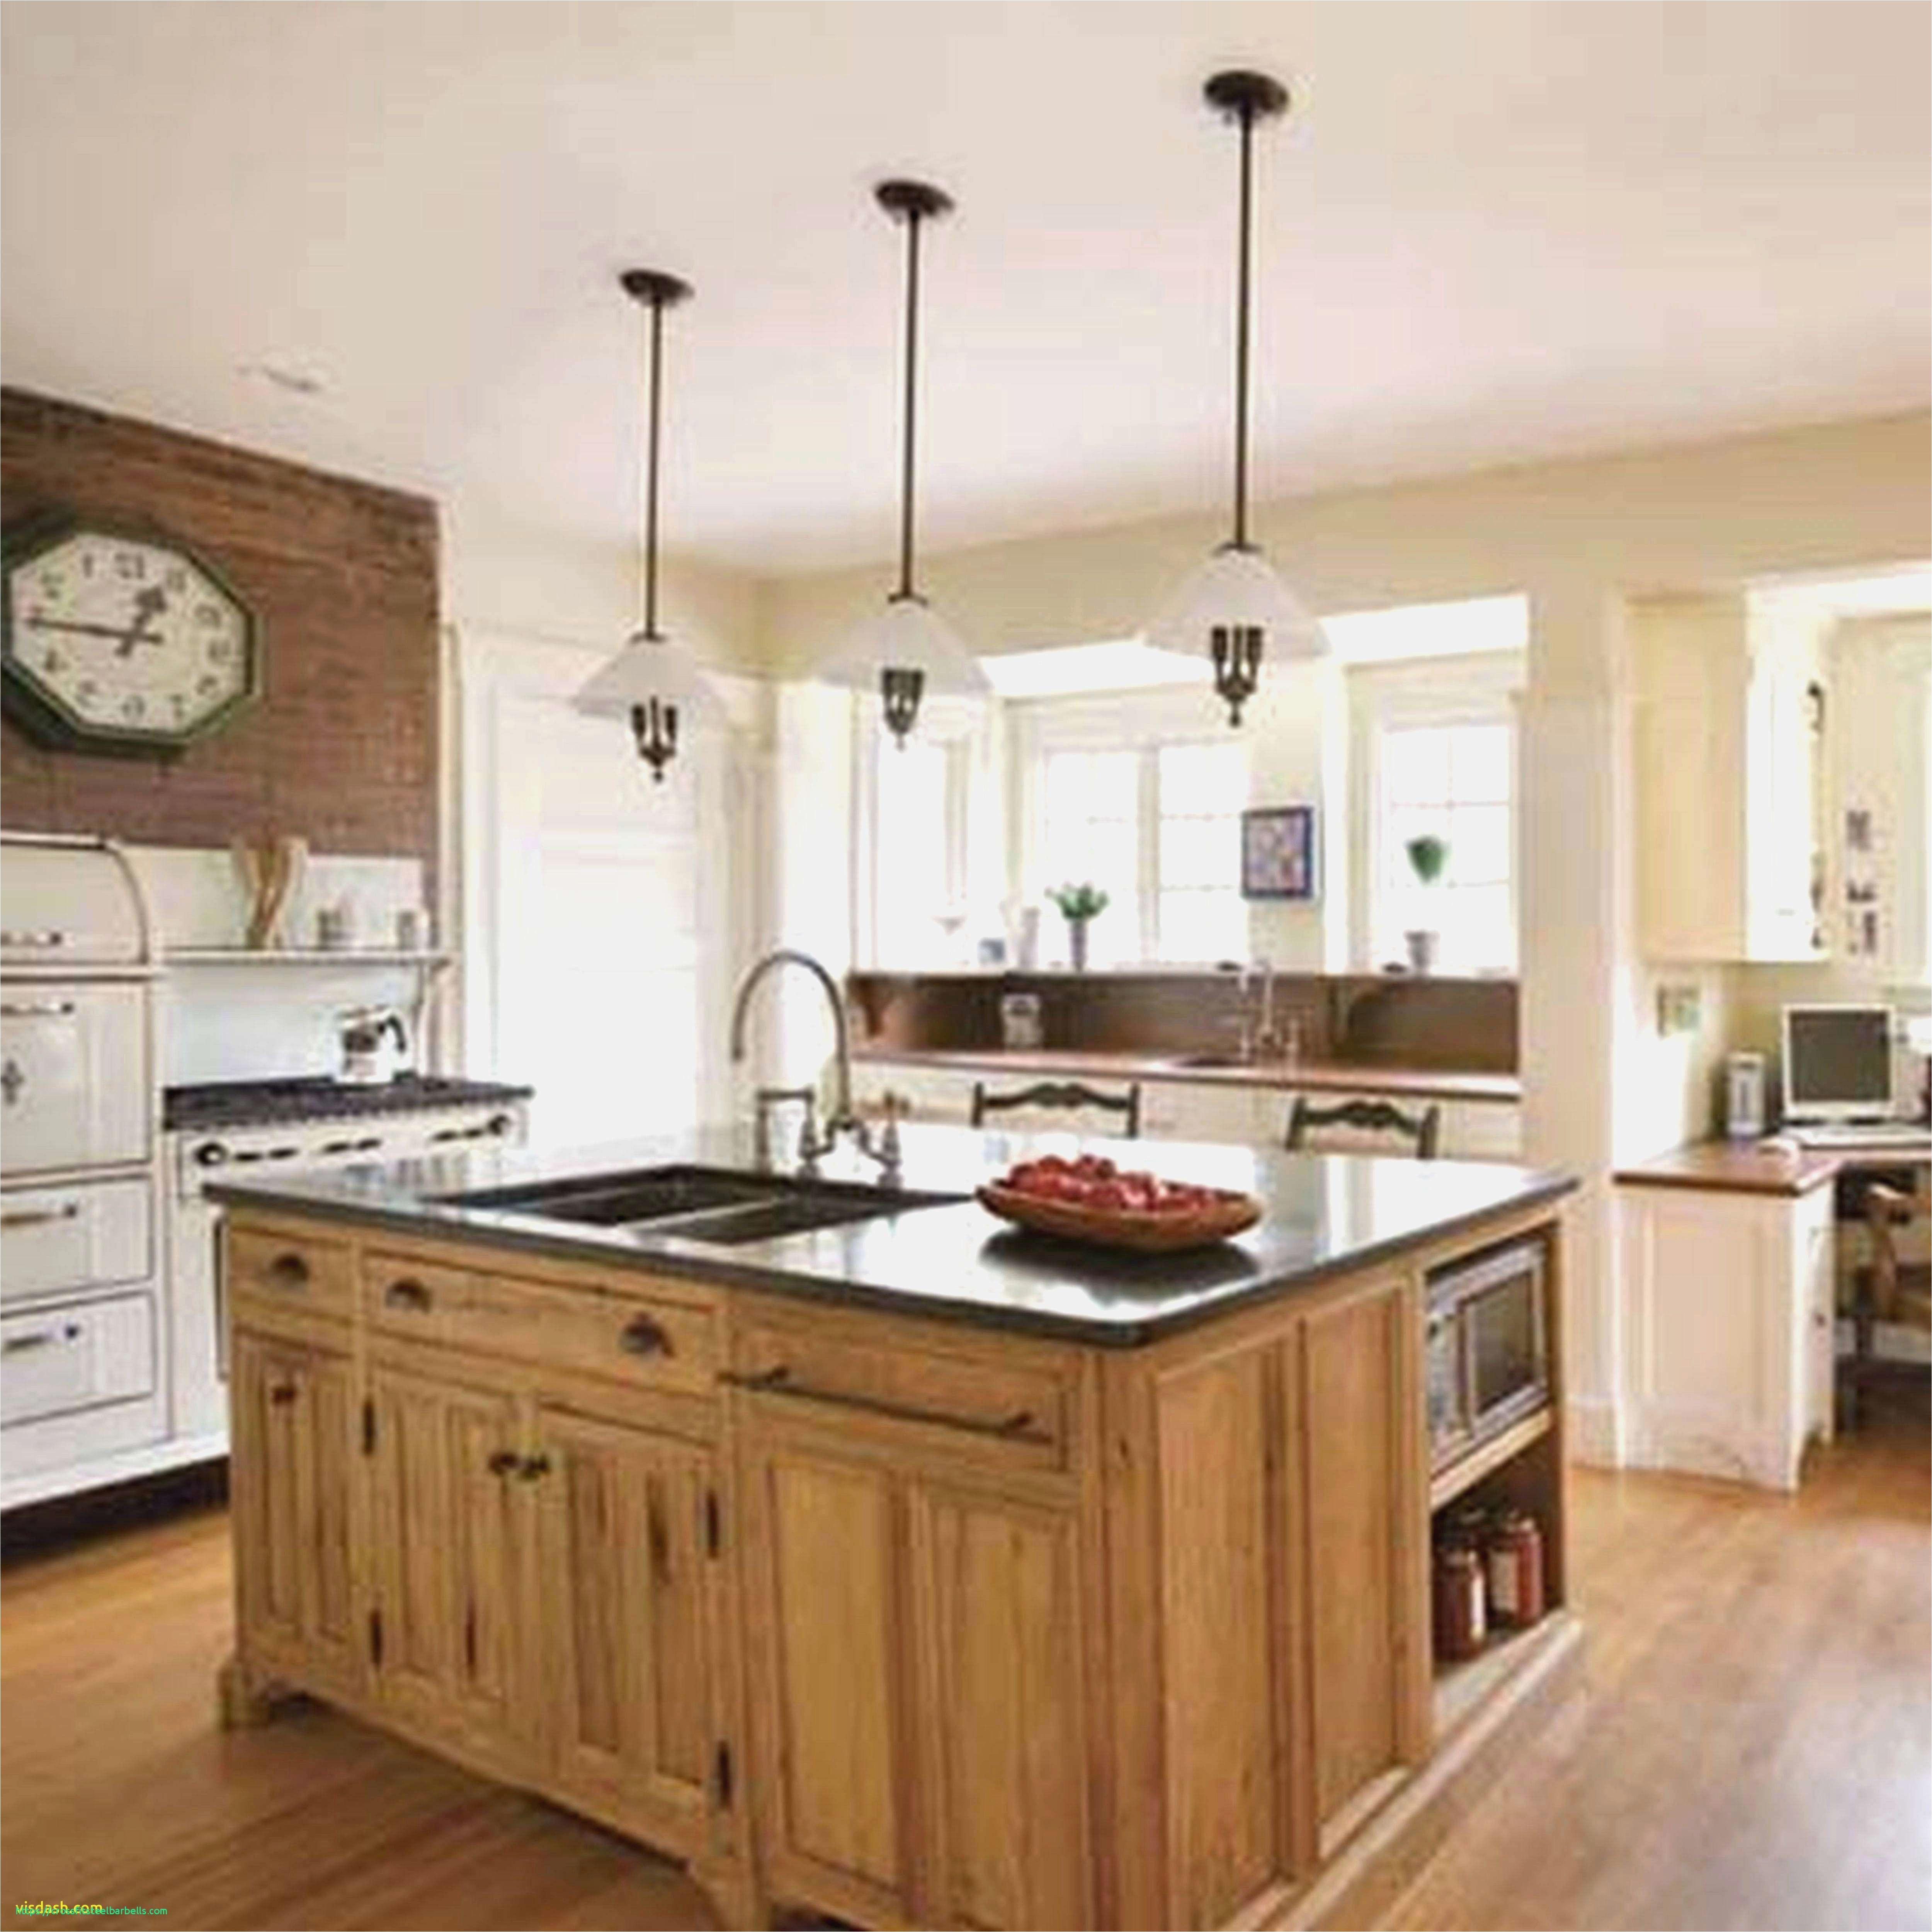 furniture creative craigslist mcallen edinburg furniture cool home design beautiful on interior design ideas craigslist